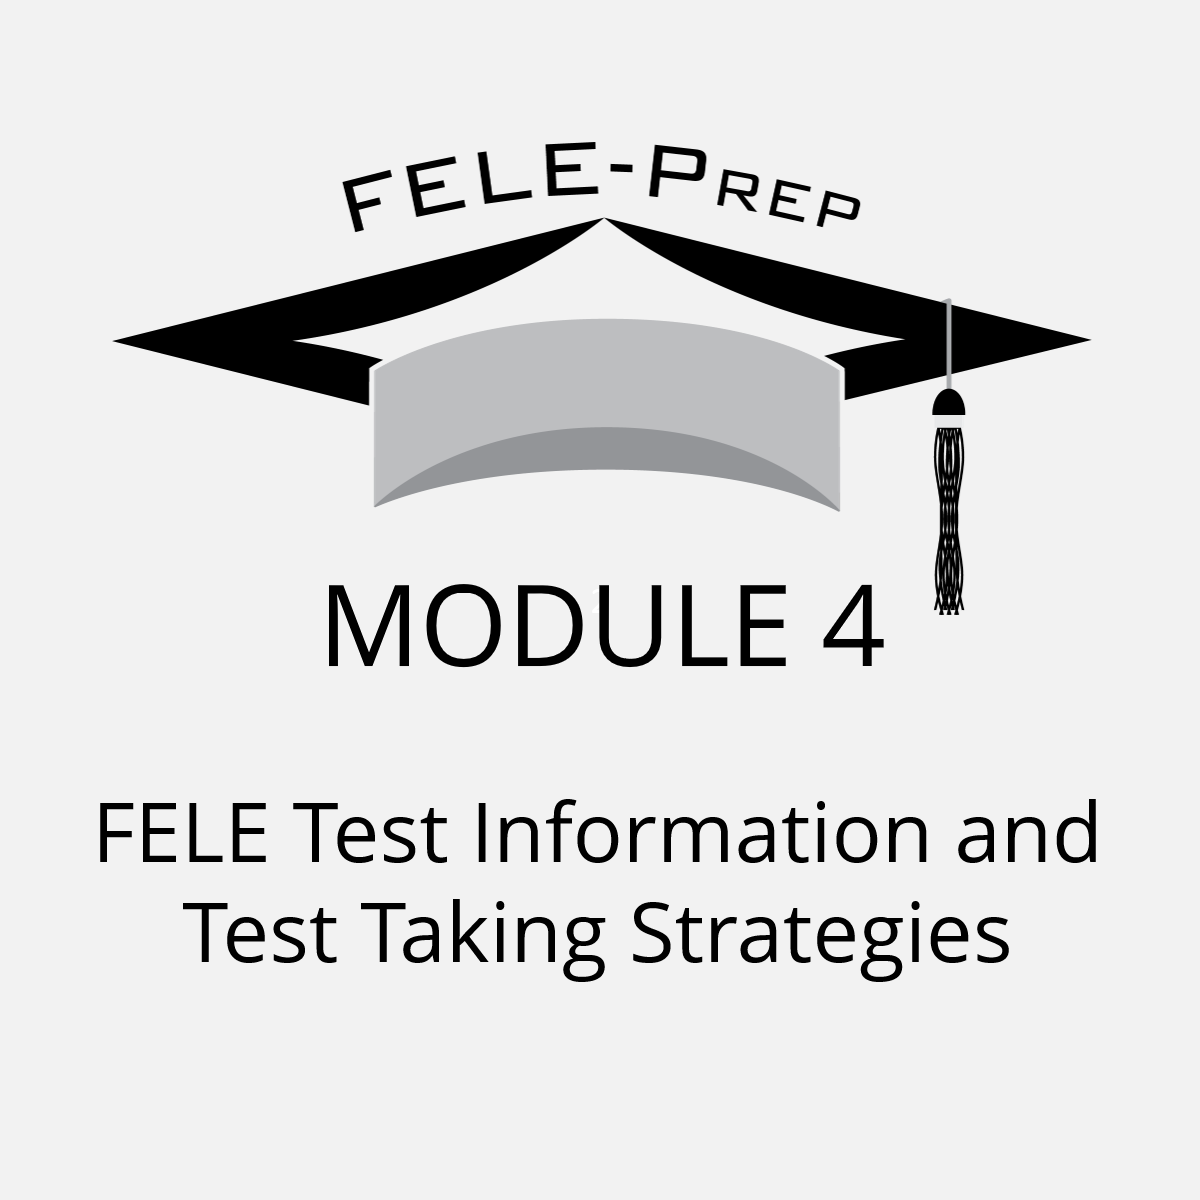 Module 4 – FELE Test Information and Test Taking Strategies